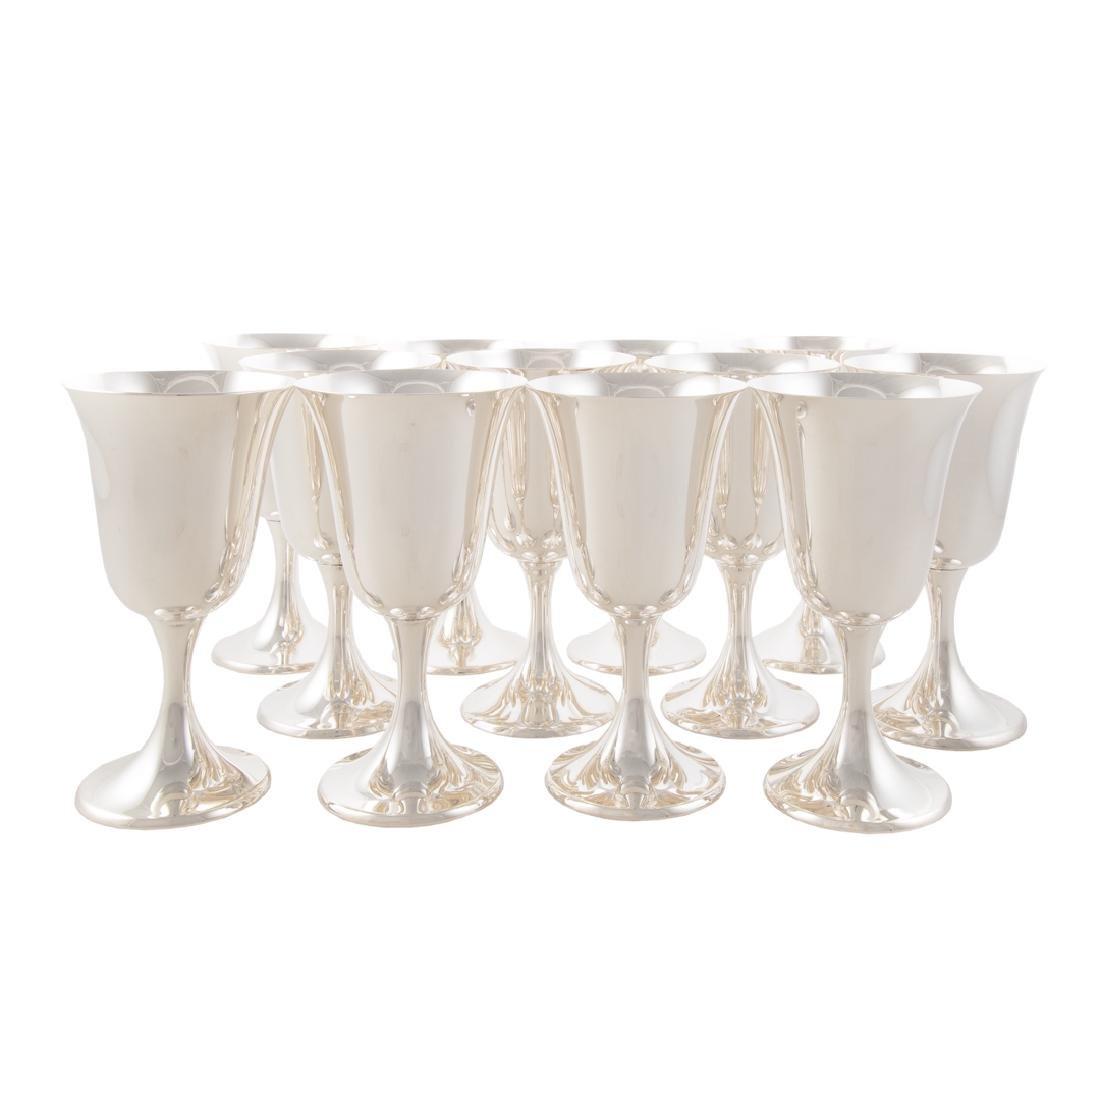 Set of 12 sterling water goblets Puritan pattern